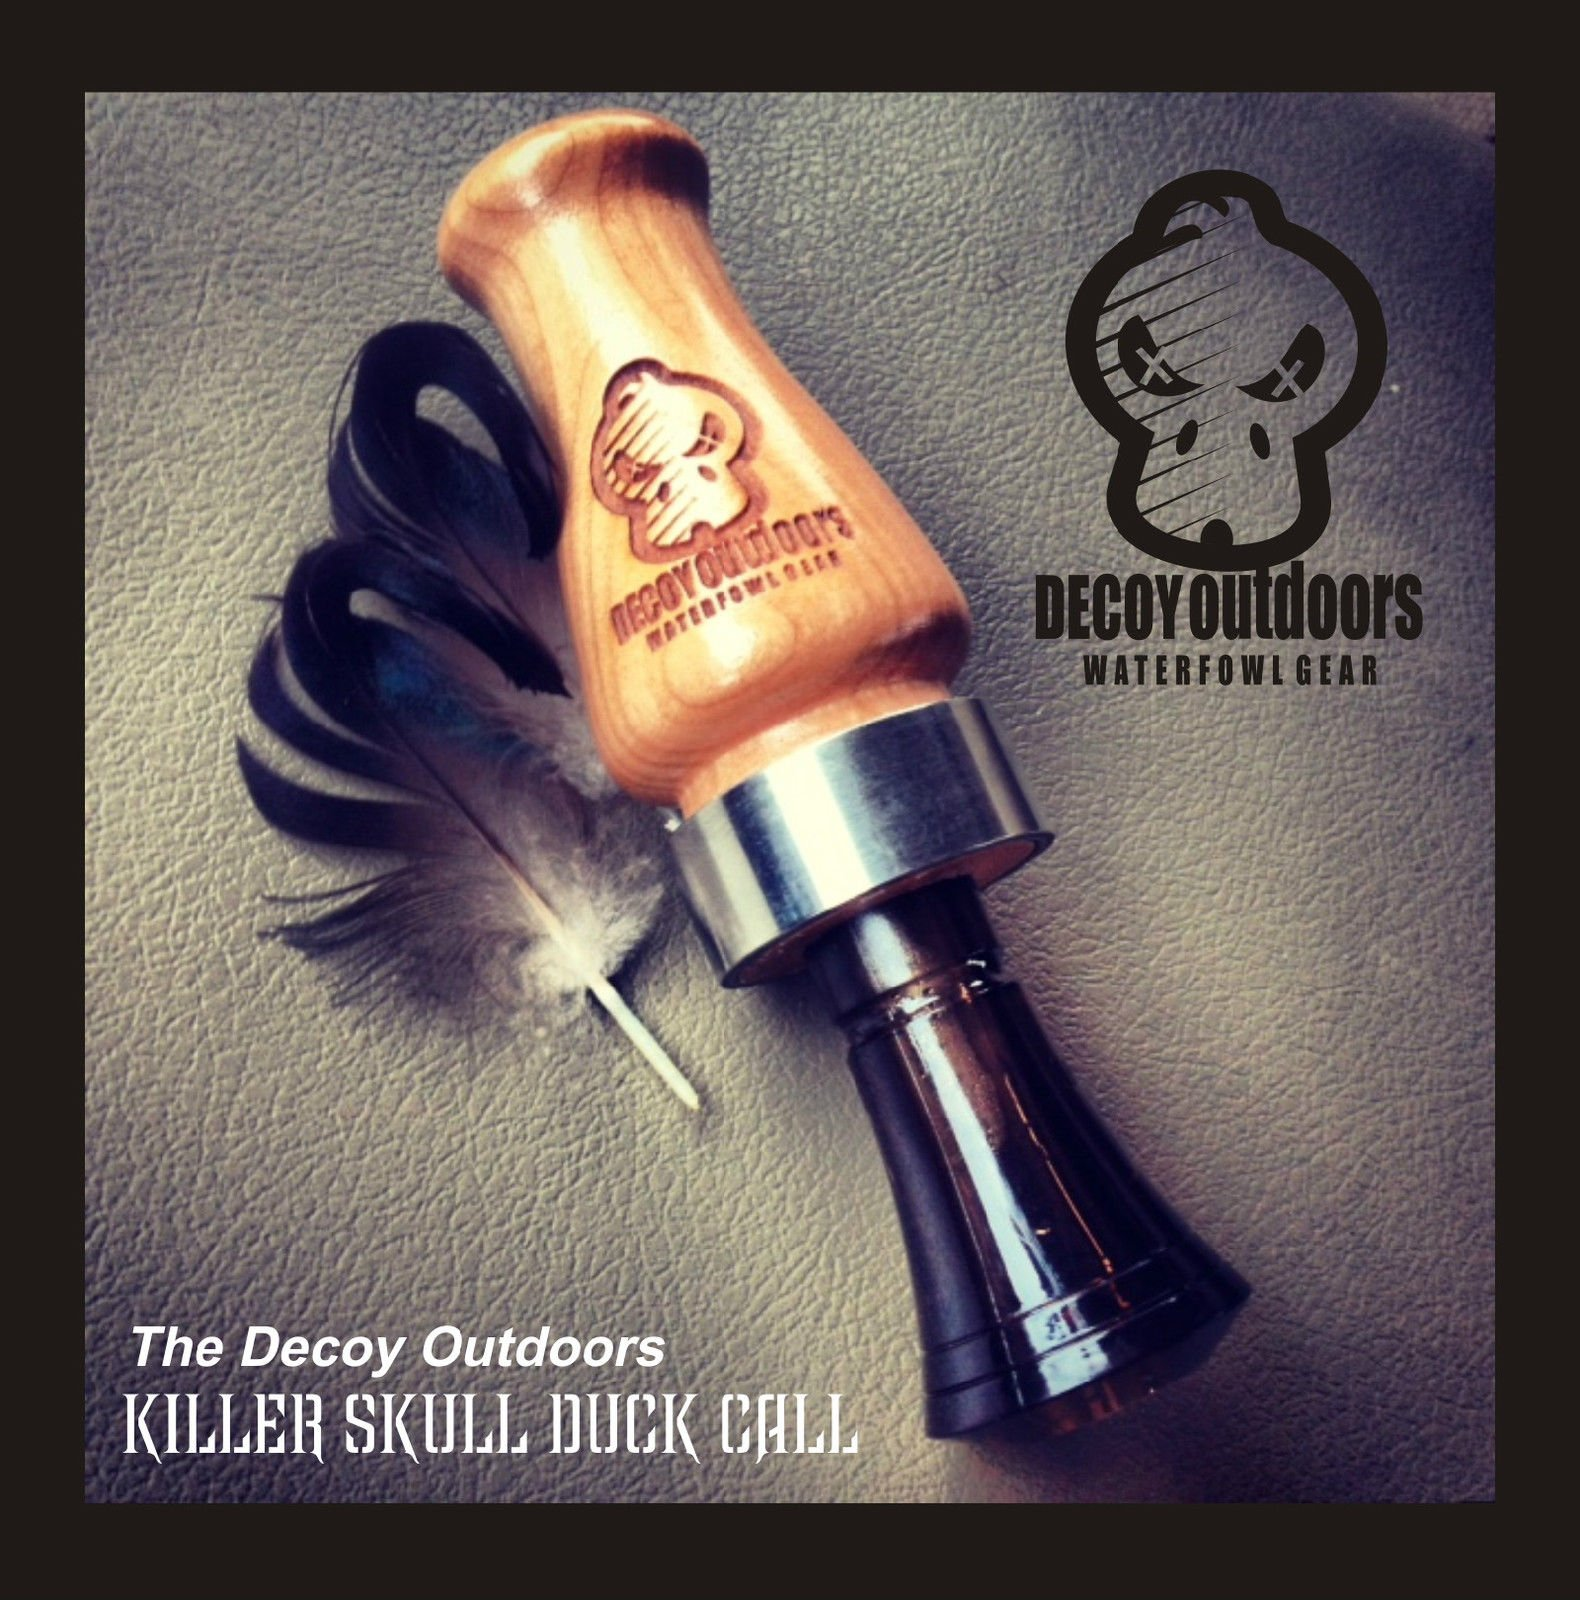 Decoy Outdoors Wooden Duck Call with Killer Skull Logo